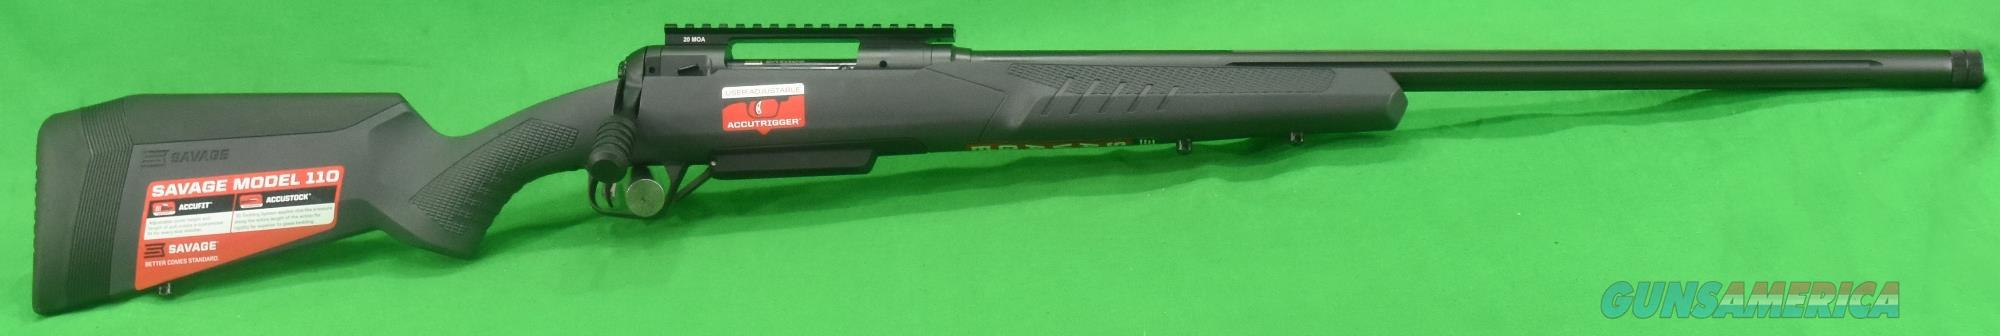 110 Tactical Gray Syn 308Win 24In  57007  Guns > Rifles > Savage Rifles > 10/110